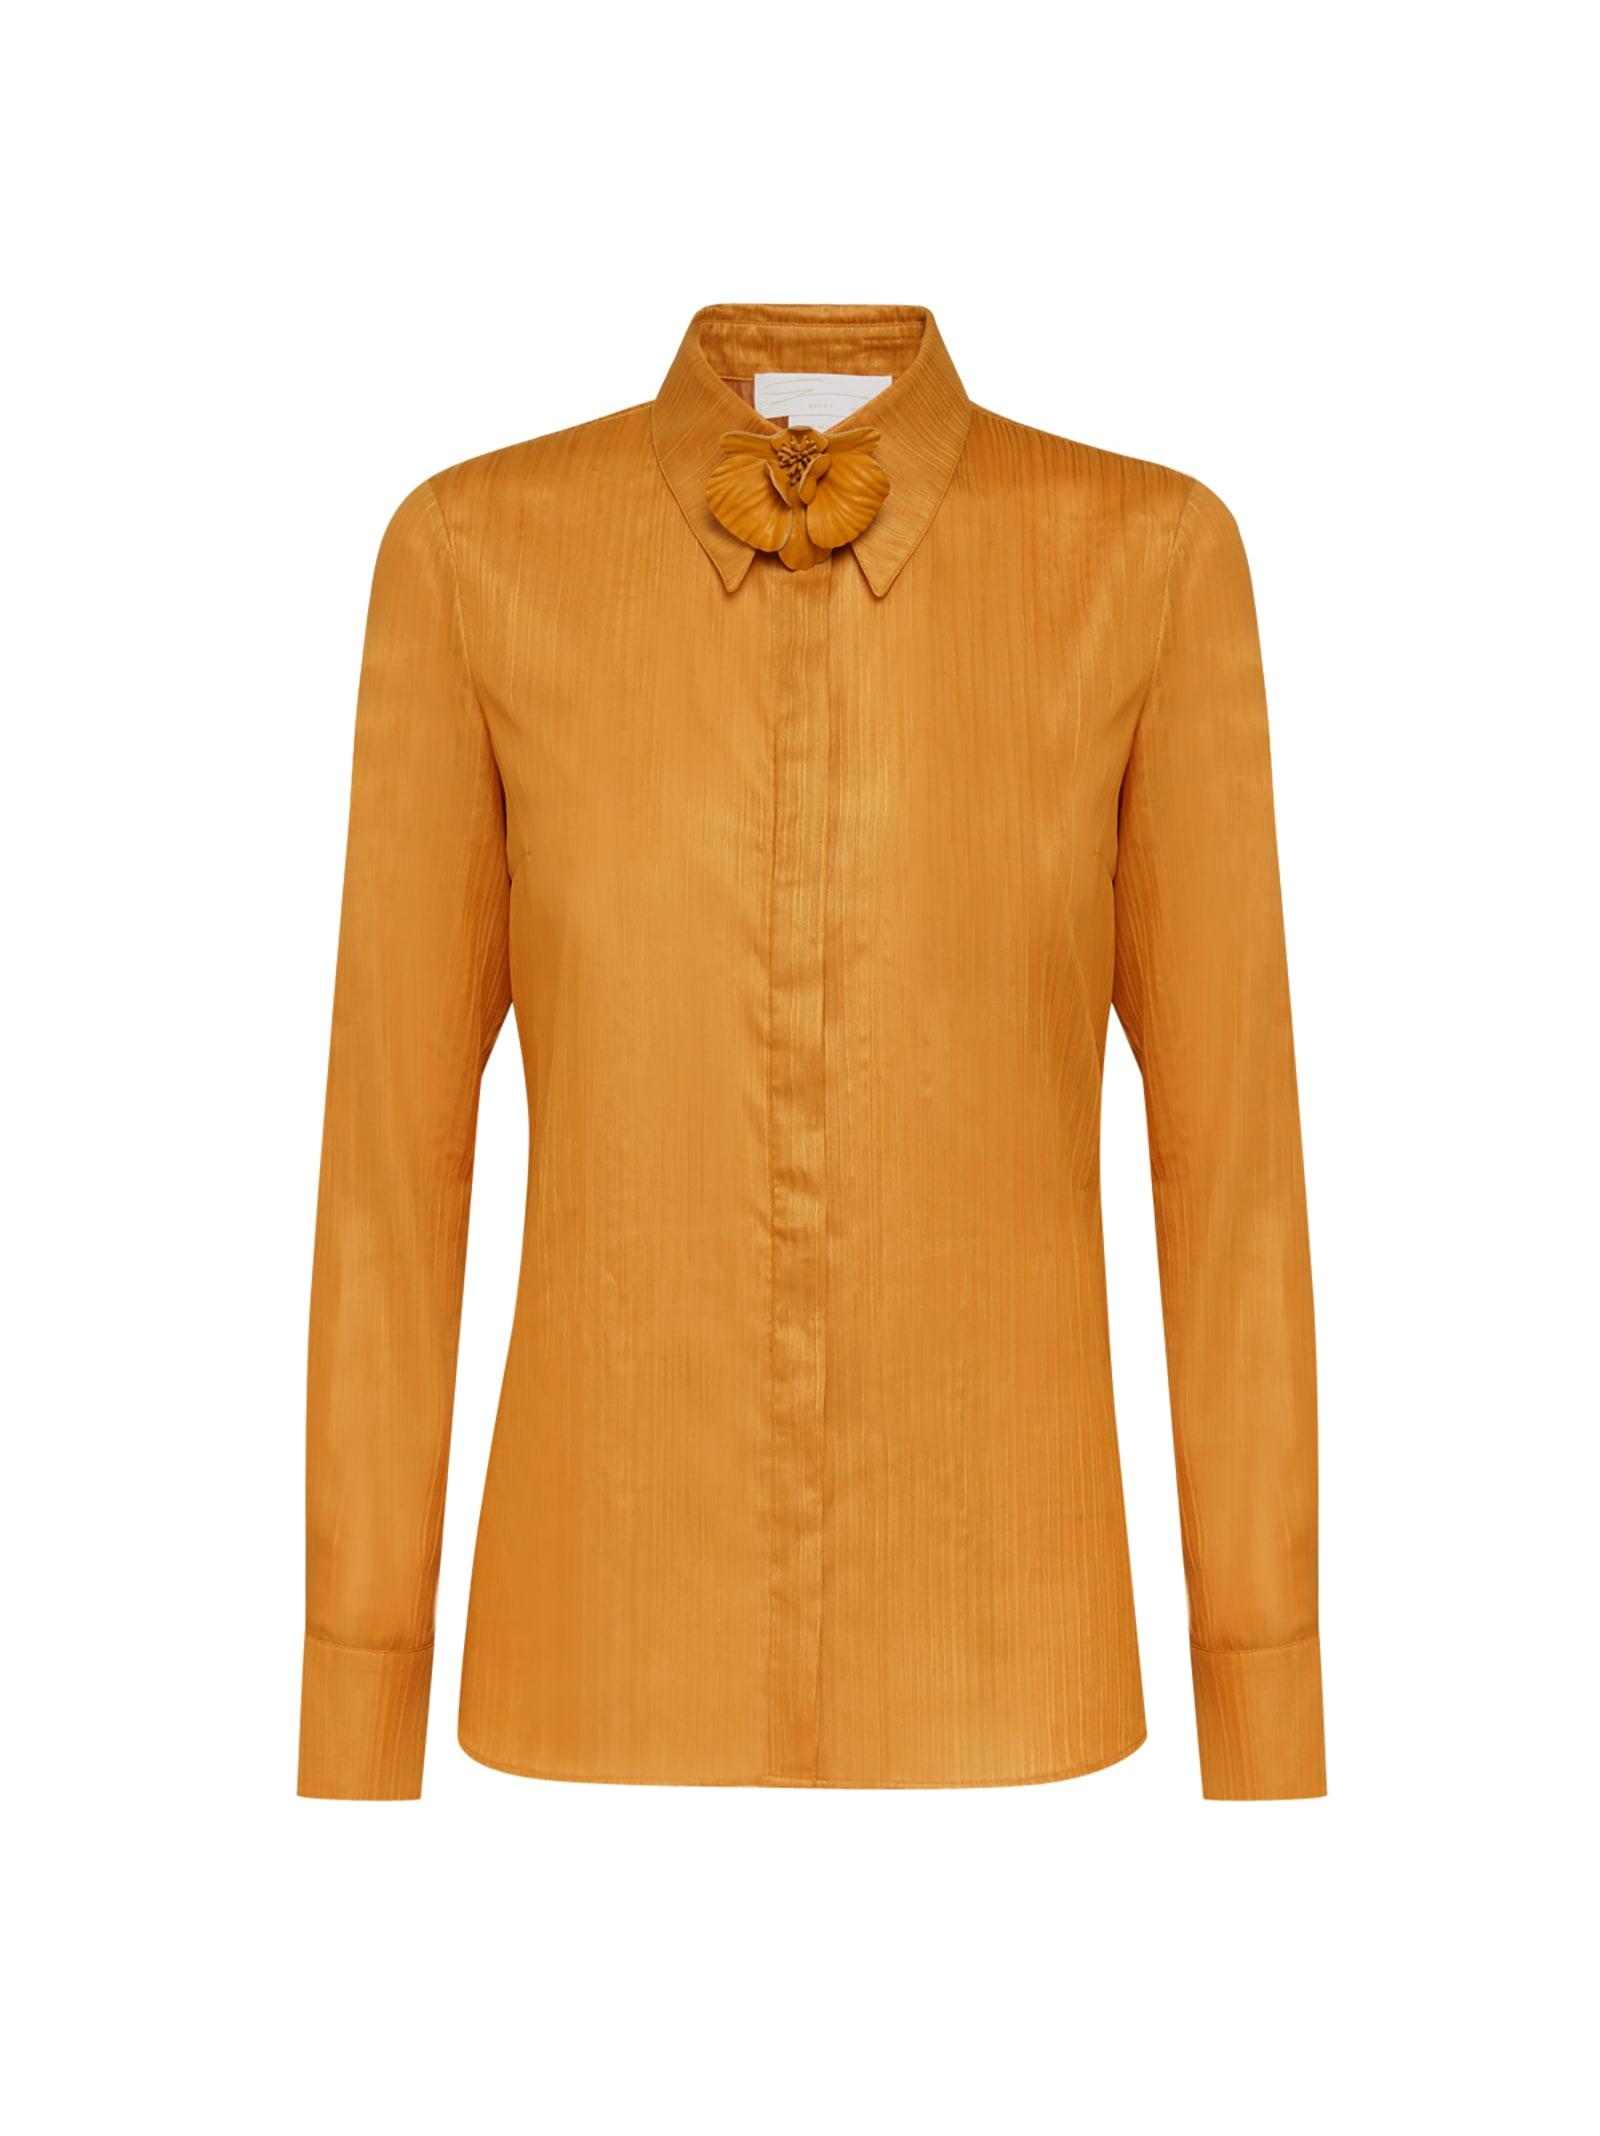 Ocher Orchid-embellished Shirt